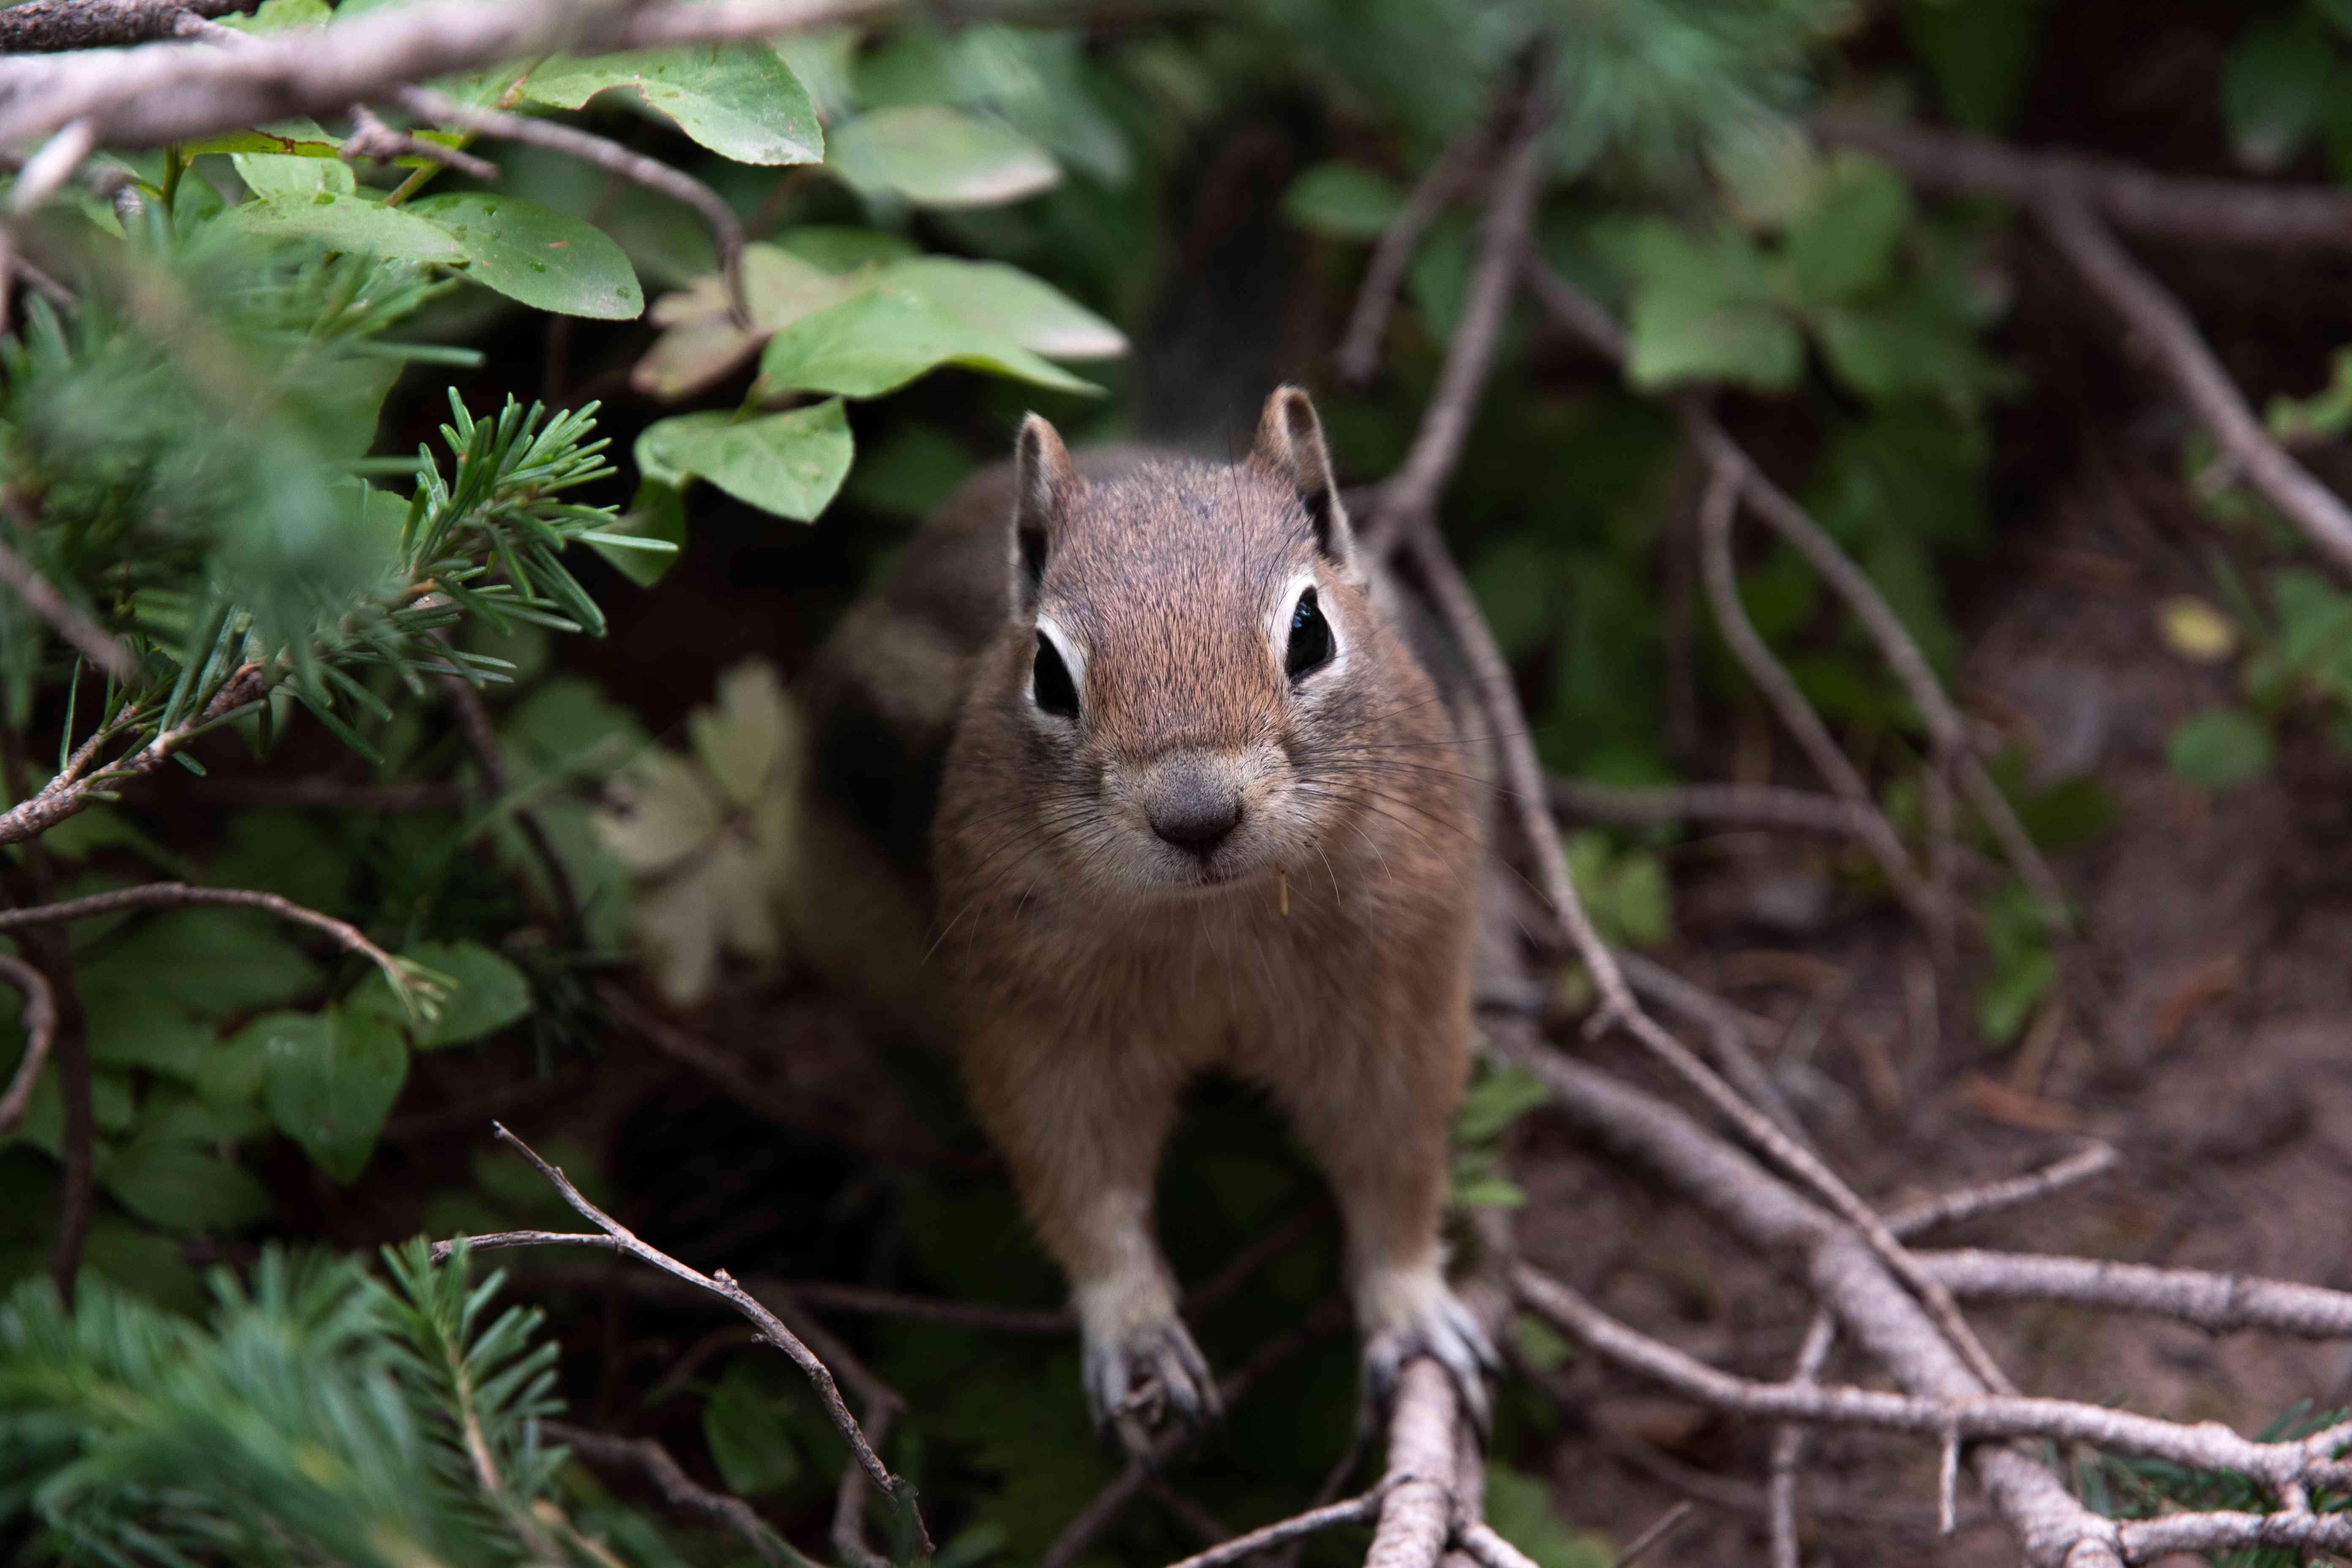 cute squirrel looks into camera